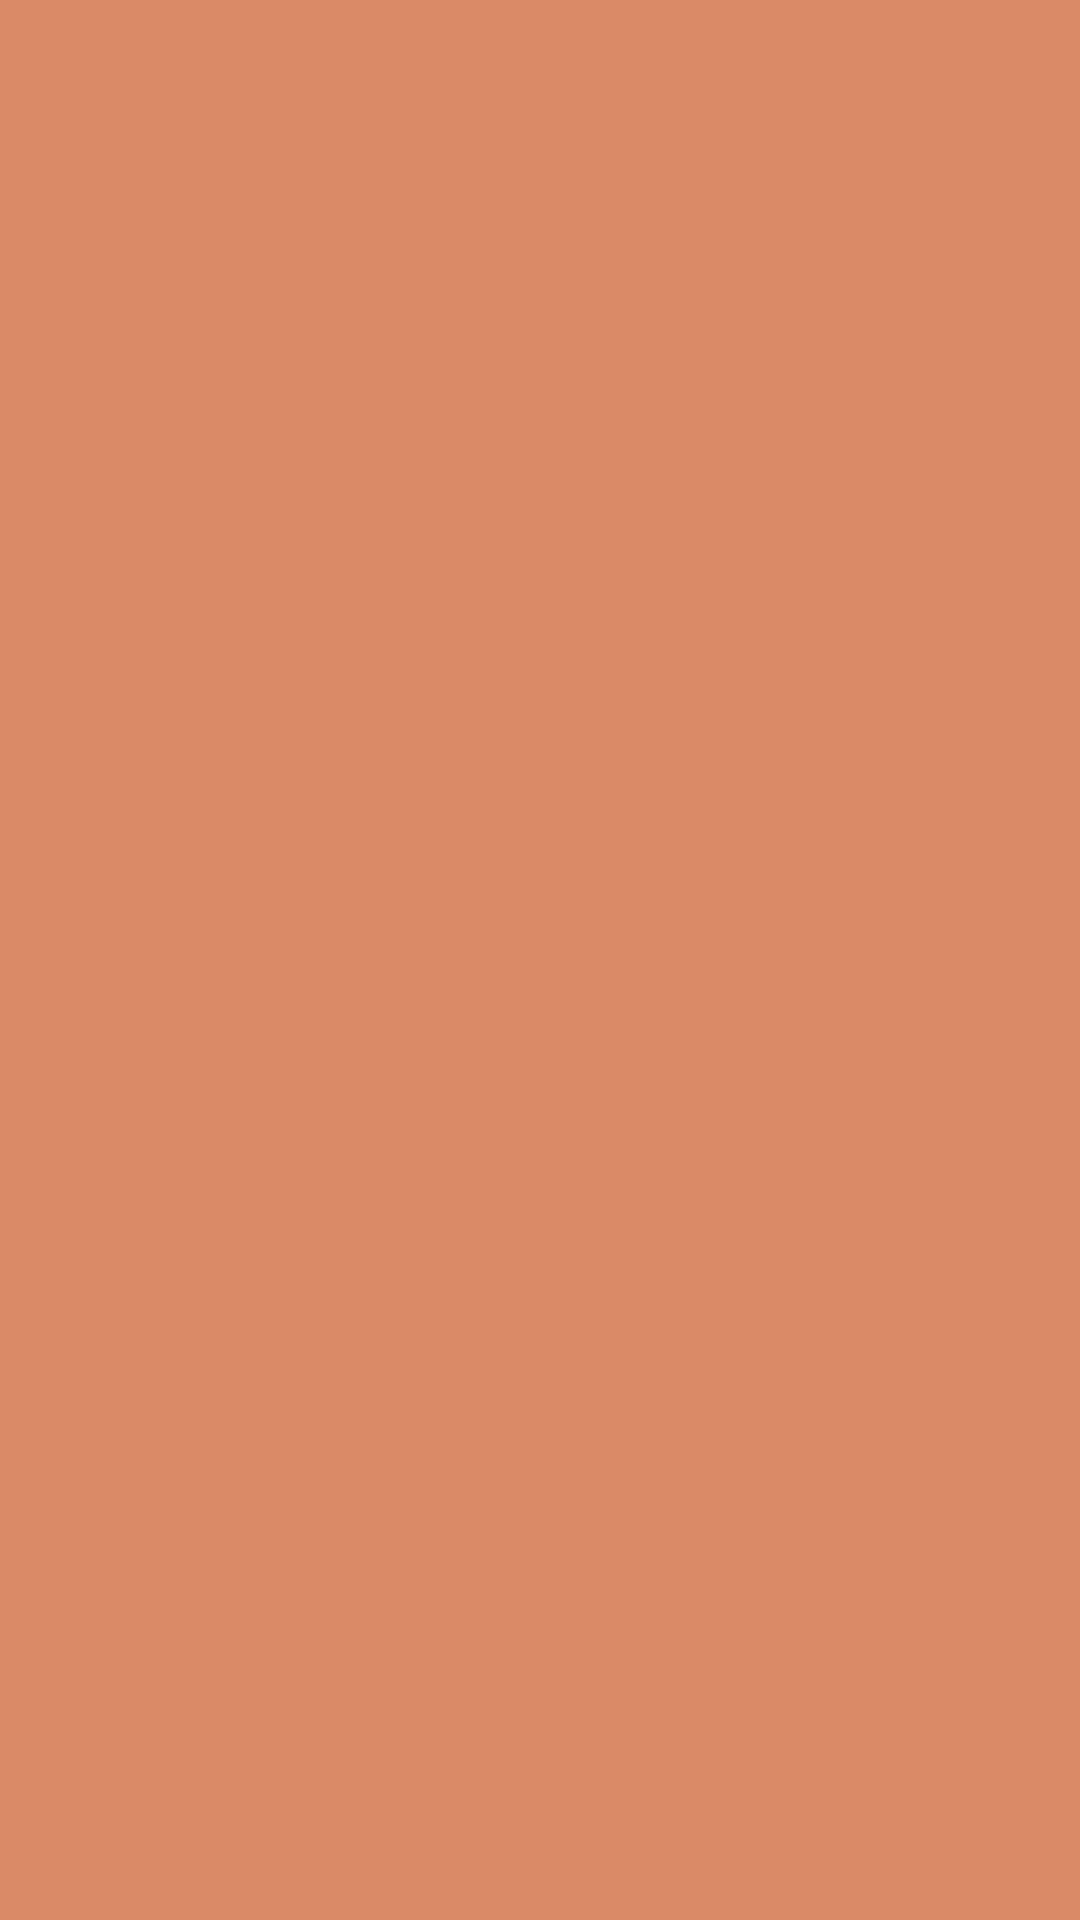 1080x1920 Copper Crayola Solid Color Background